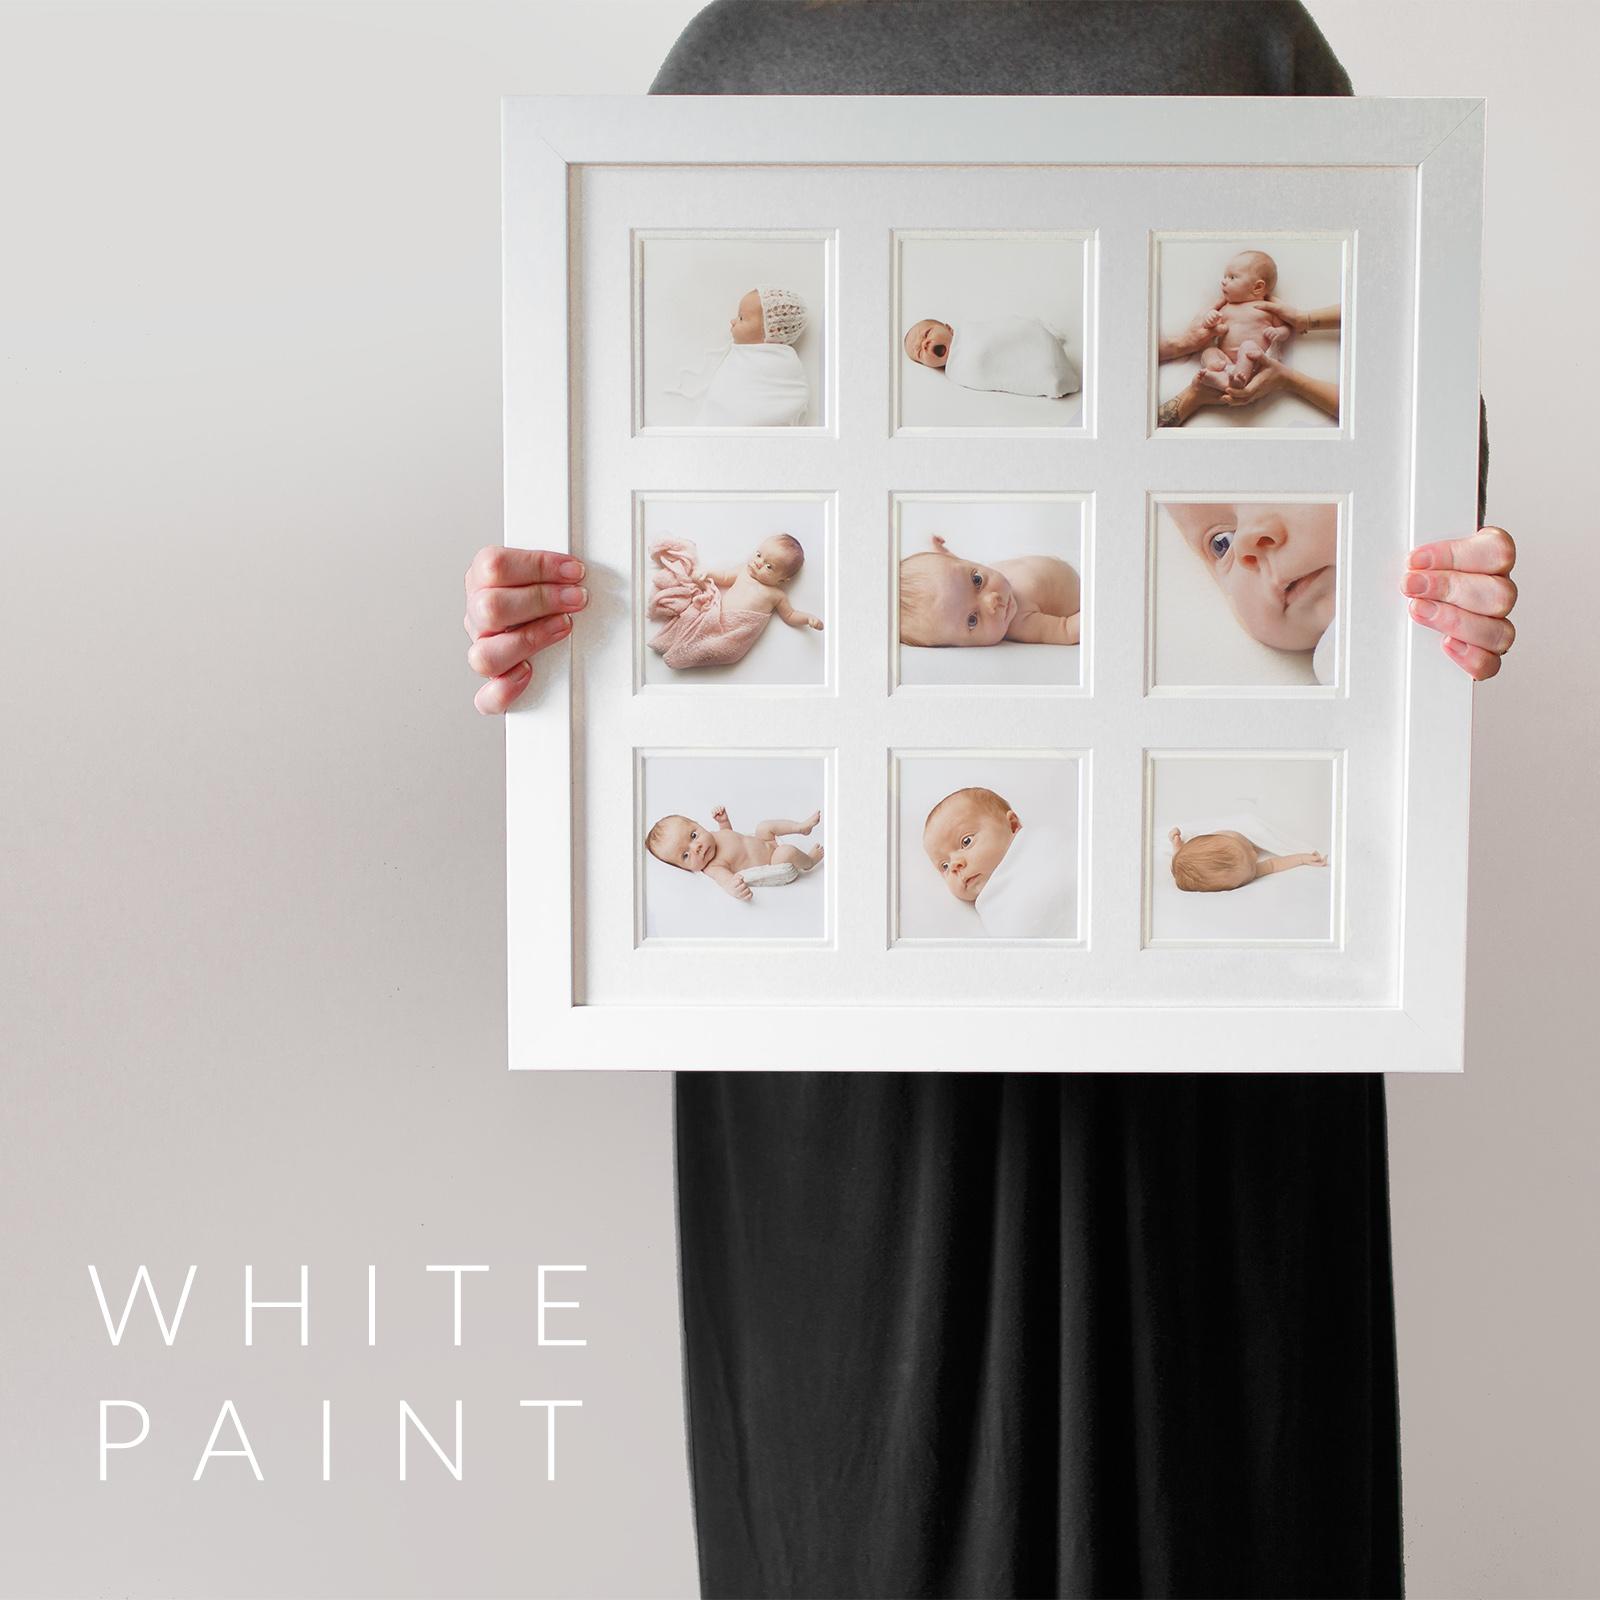 9 image frame white paint